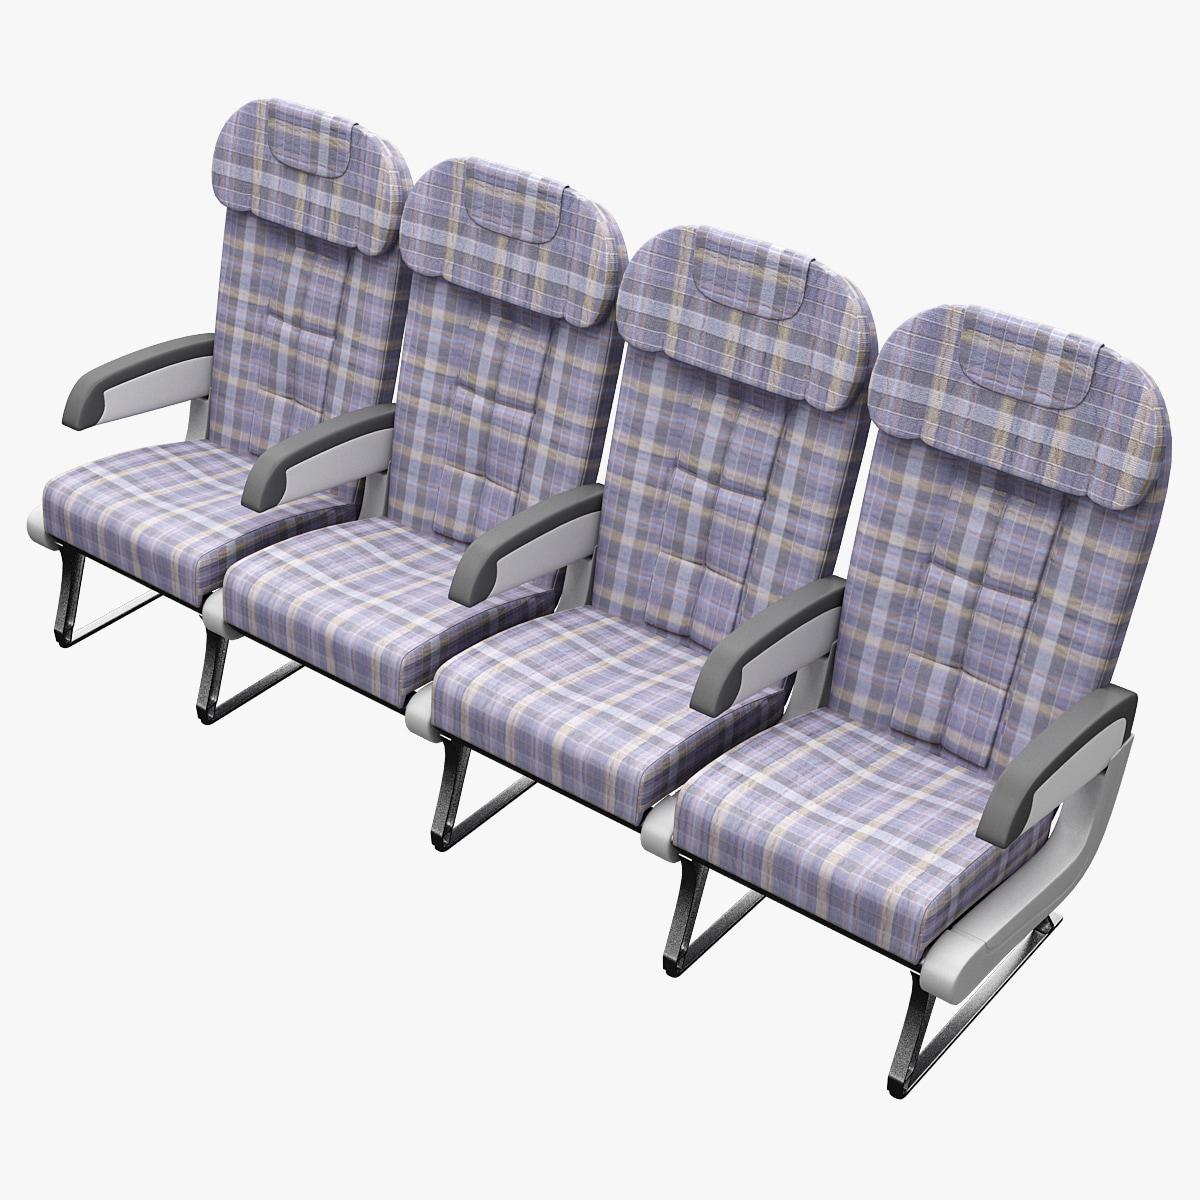 Aircraft_Passenger_Seats_v2_0002_2.jpg